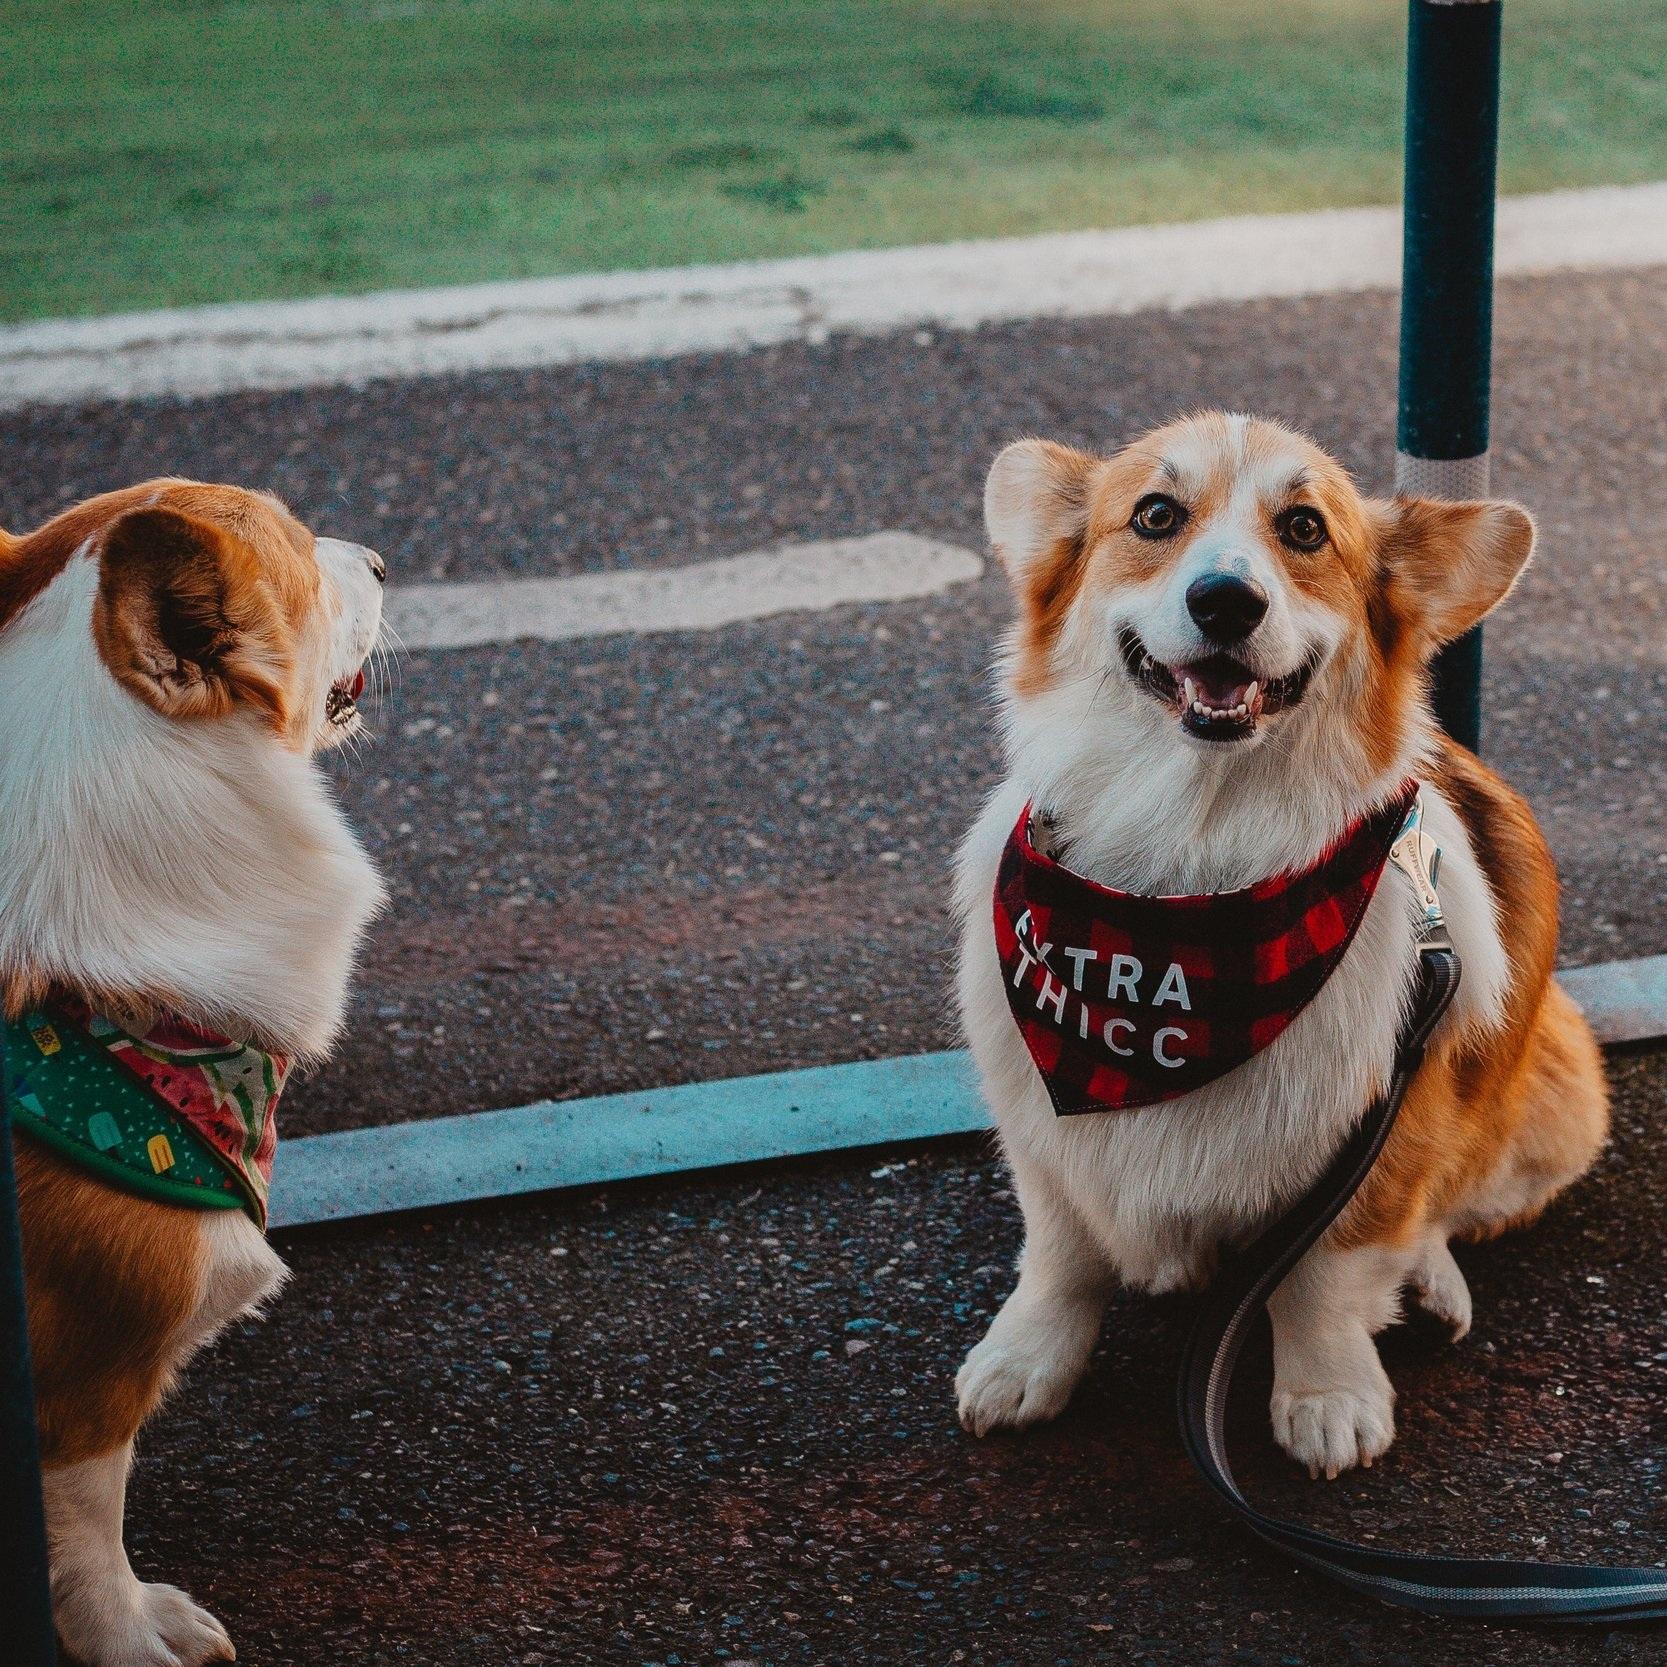 animal-photography-animals-canine-2463238.jpg